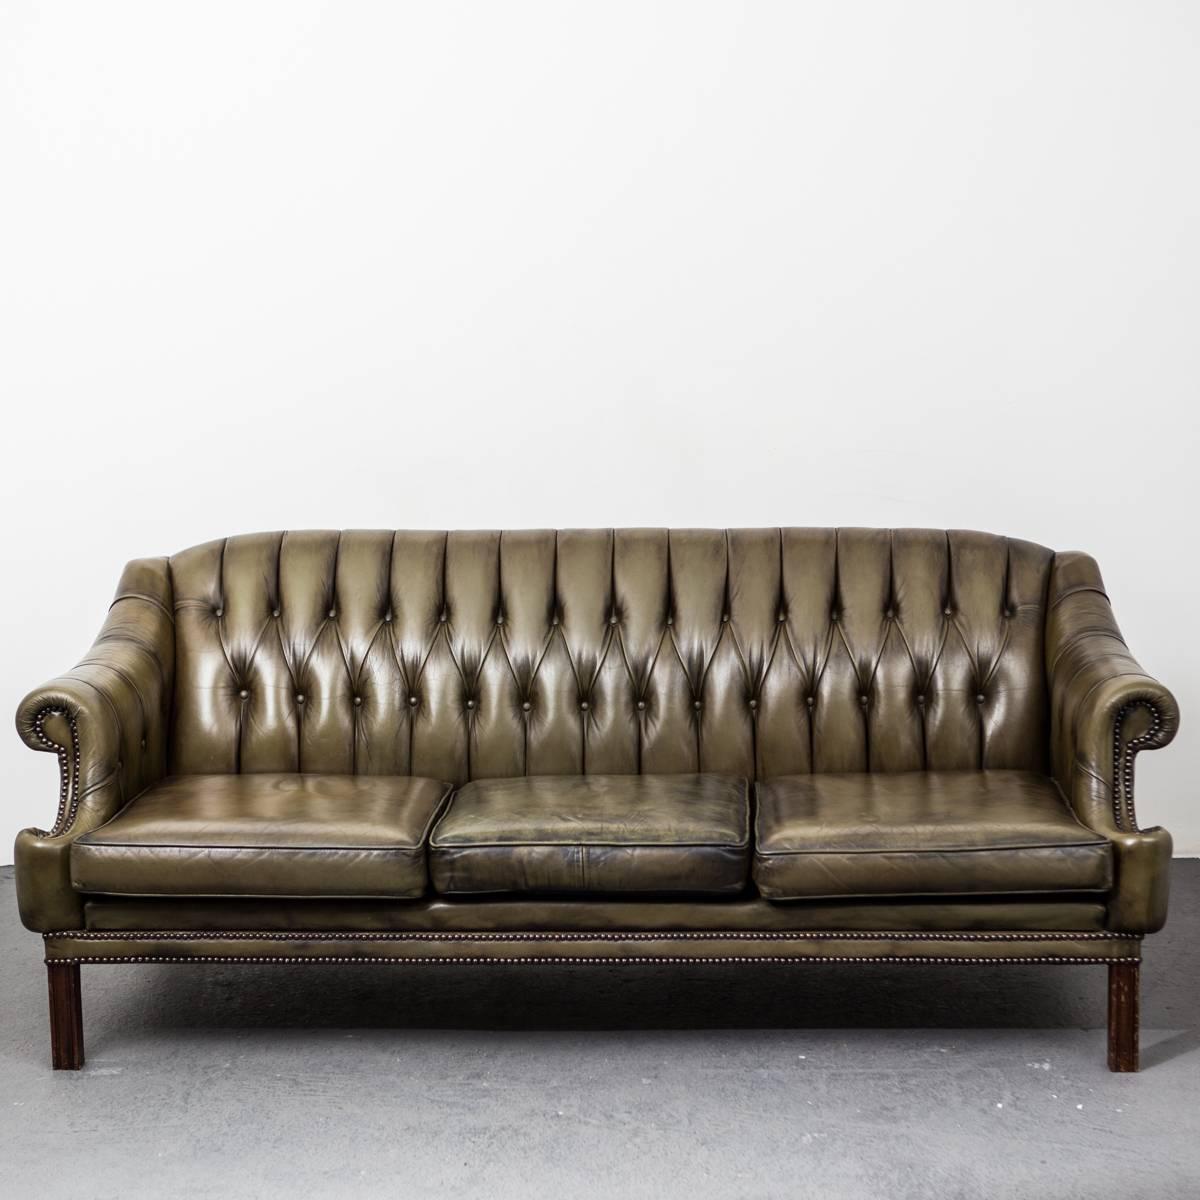 green leather sofa england at 1stdibs